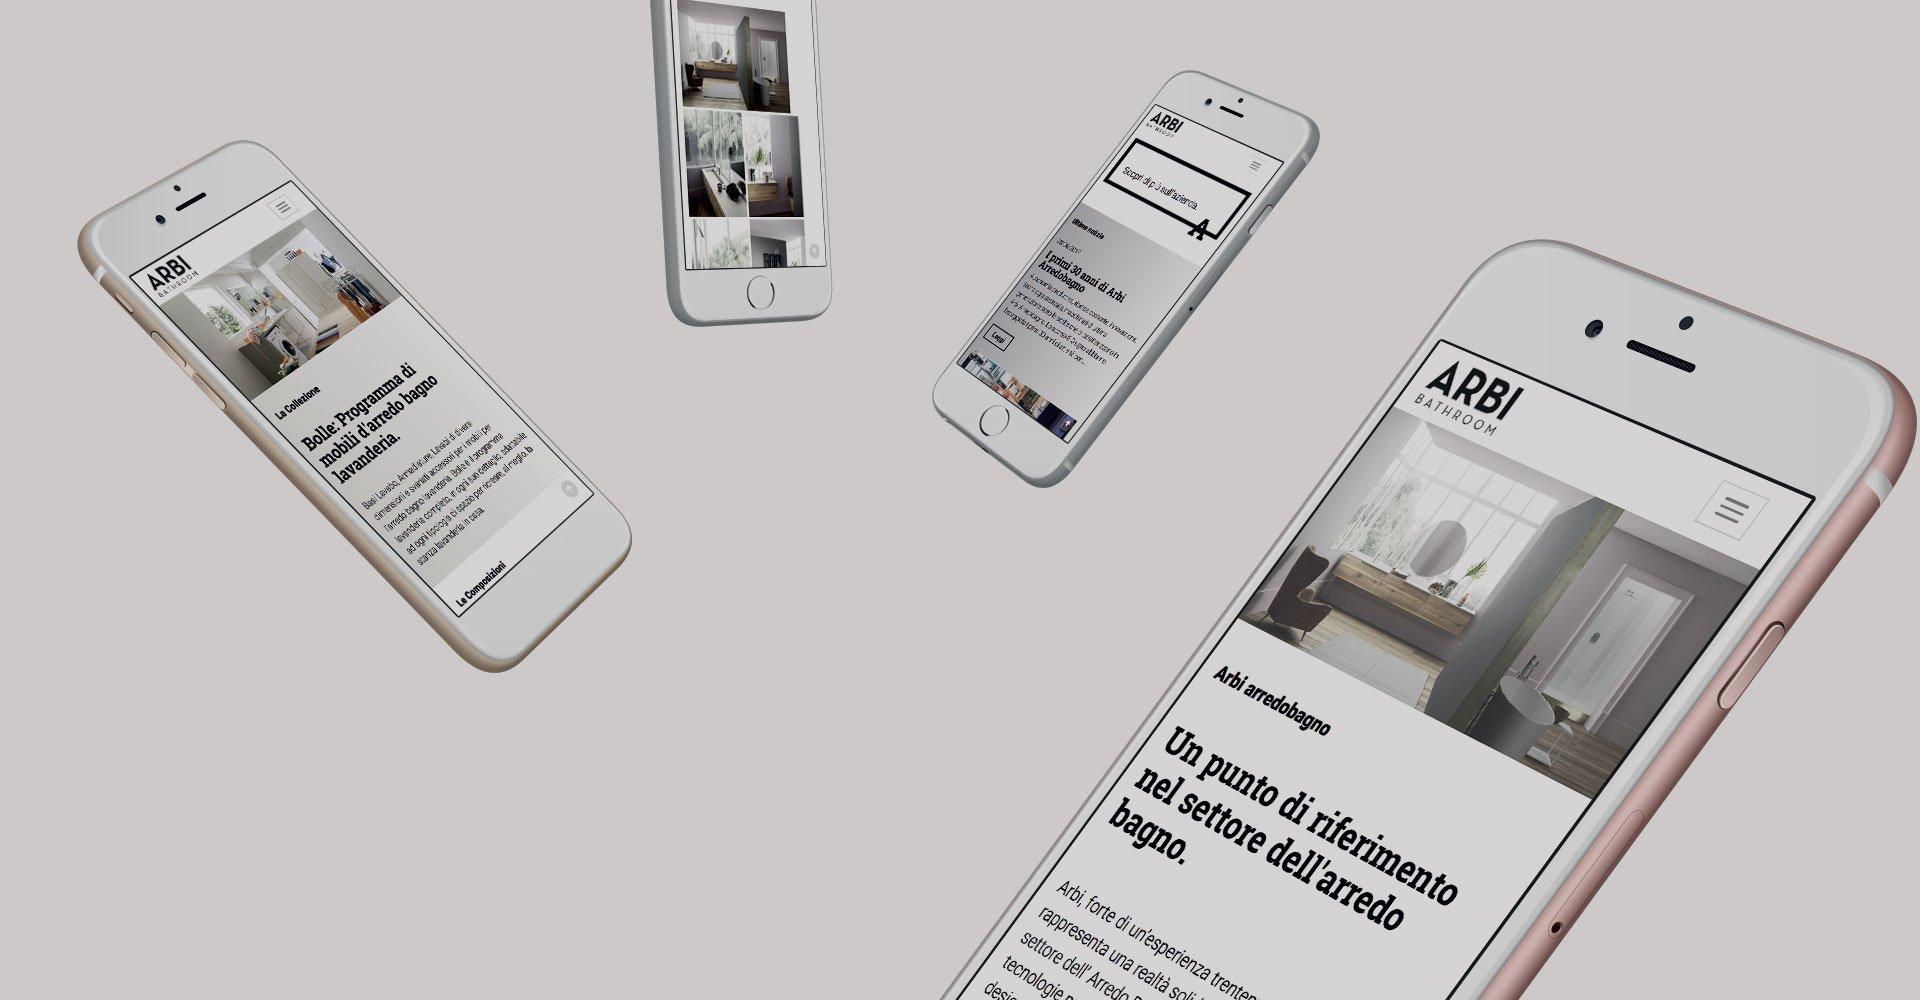 sito mobile arbi arredobagno